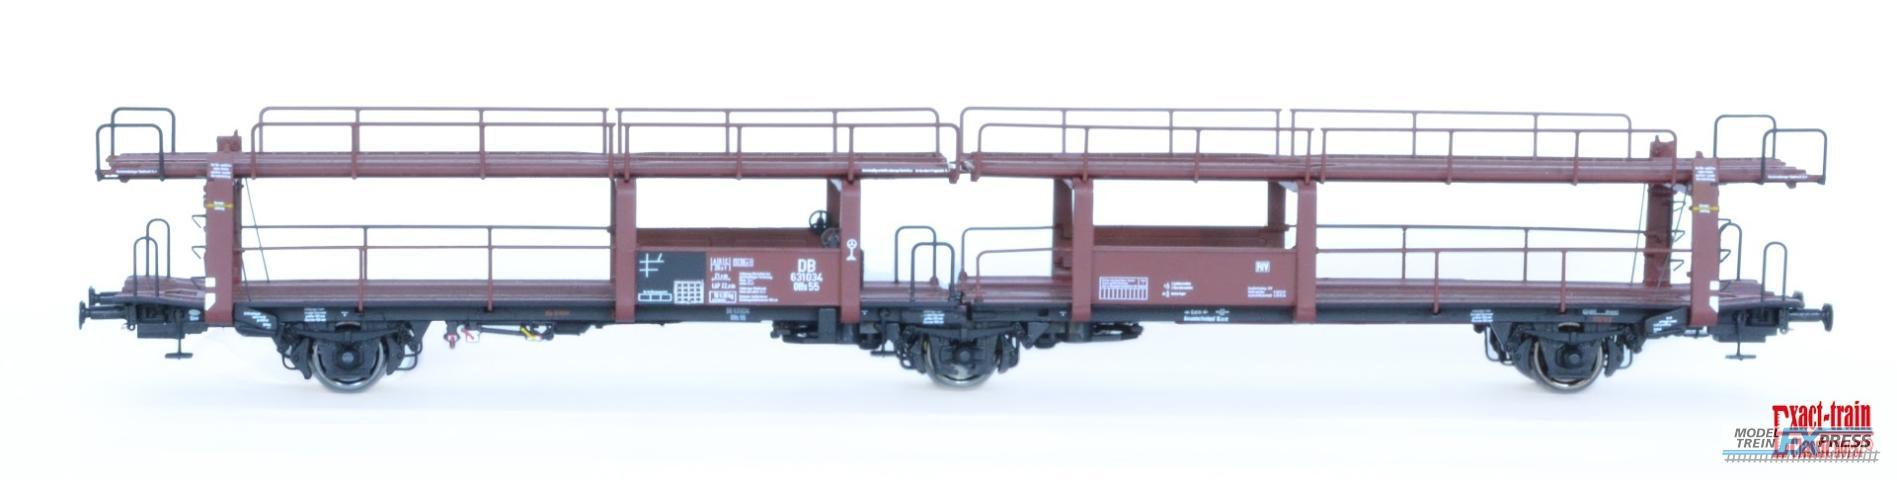 Exact-train 20020